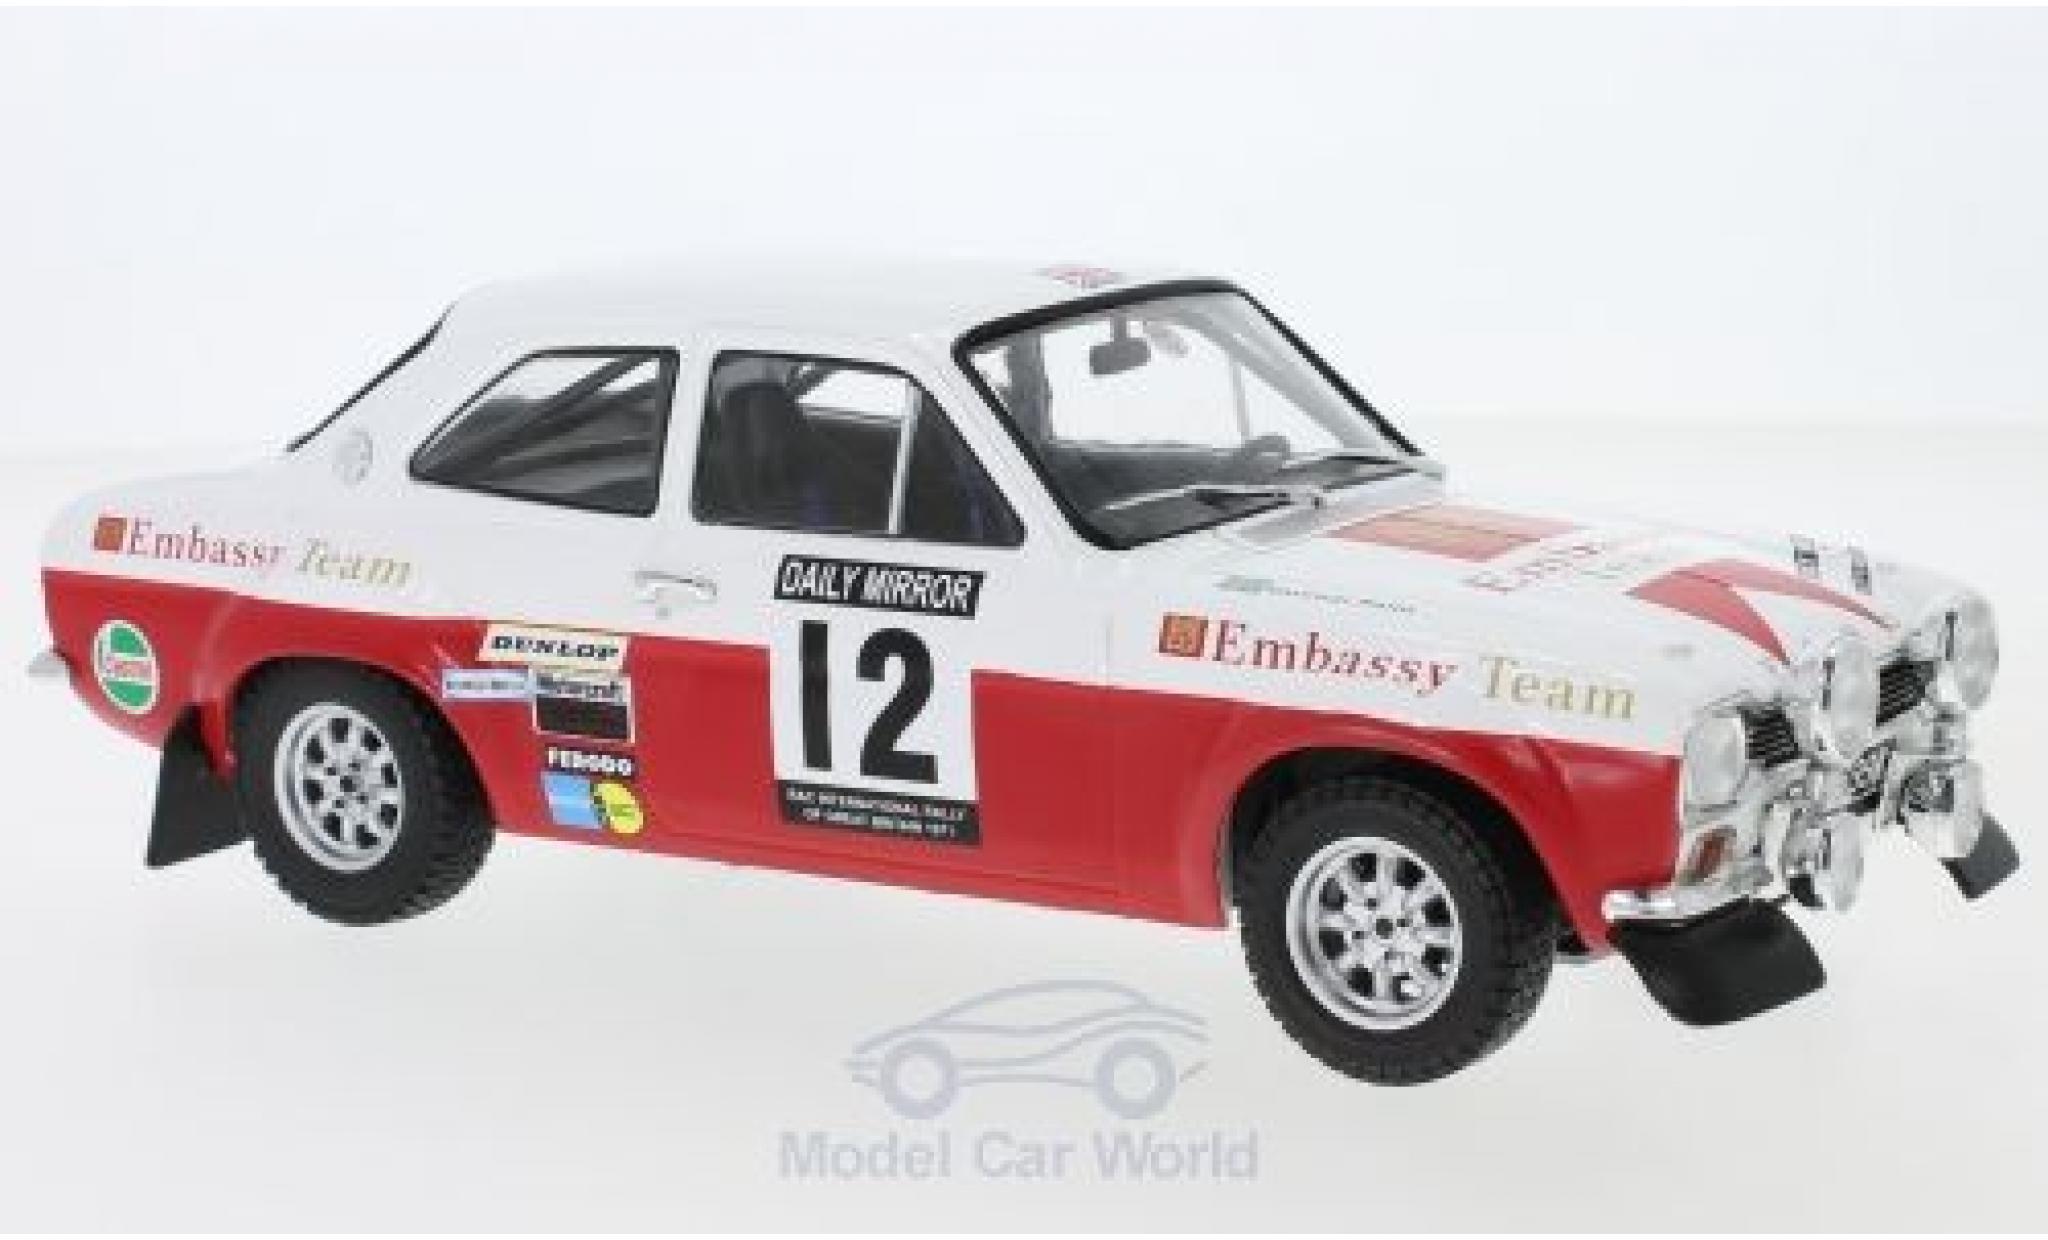 Ford Escort 1/18 IXO MK1 RS 1600 No.12 Embassy RAC Rallye 1971 H.Mikkola/G.Palm